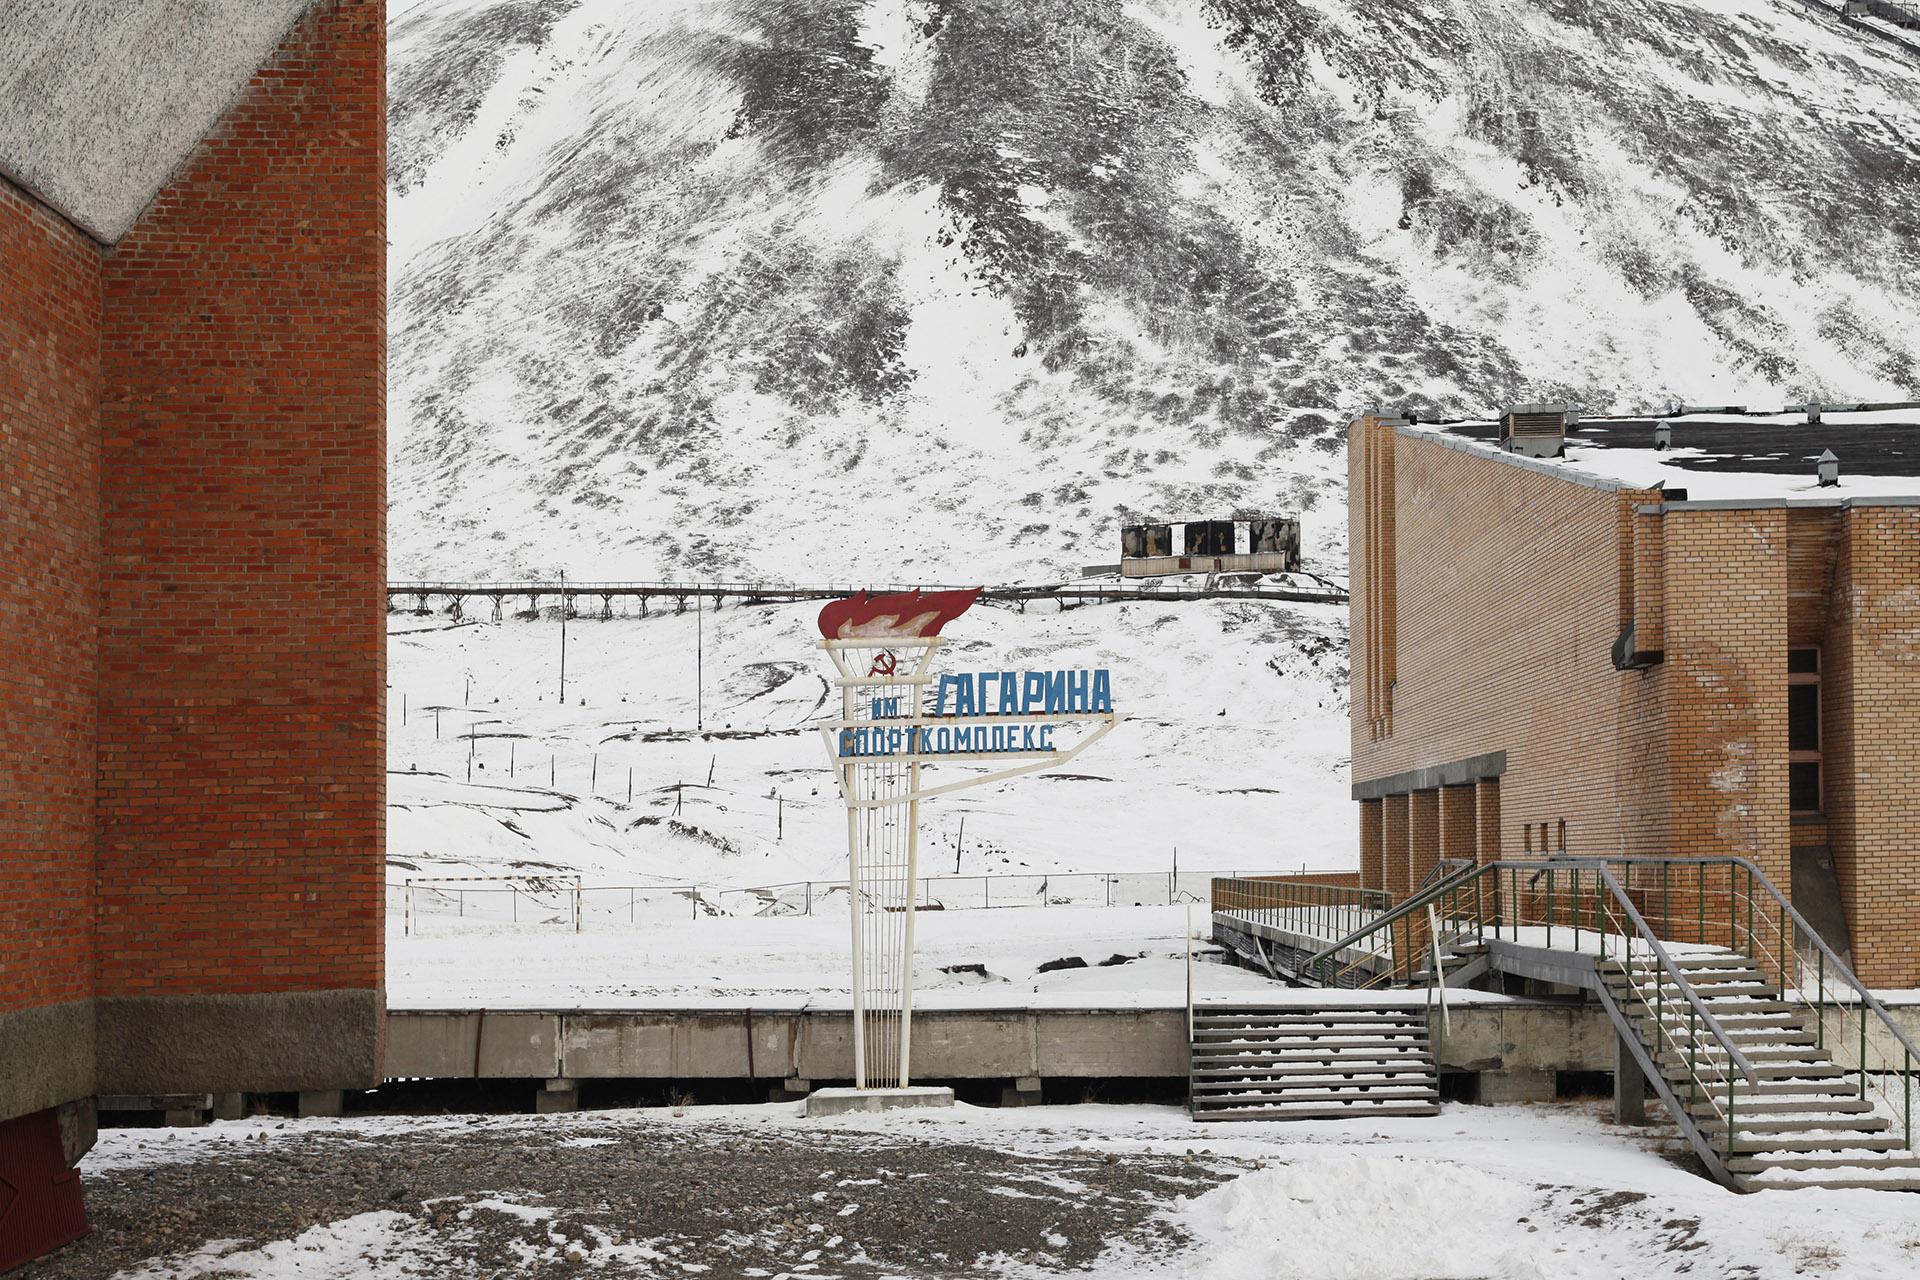 Pyramiden, Spitsbergen, Svalbard 22<br/>Impresión digital / Inject print